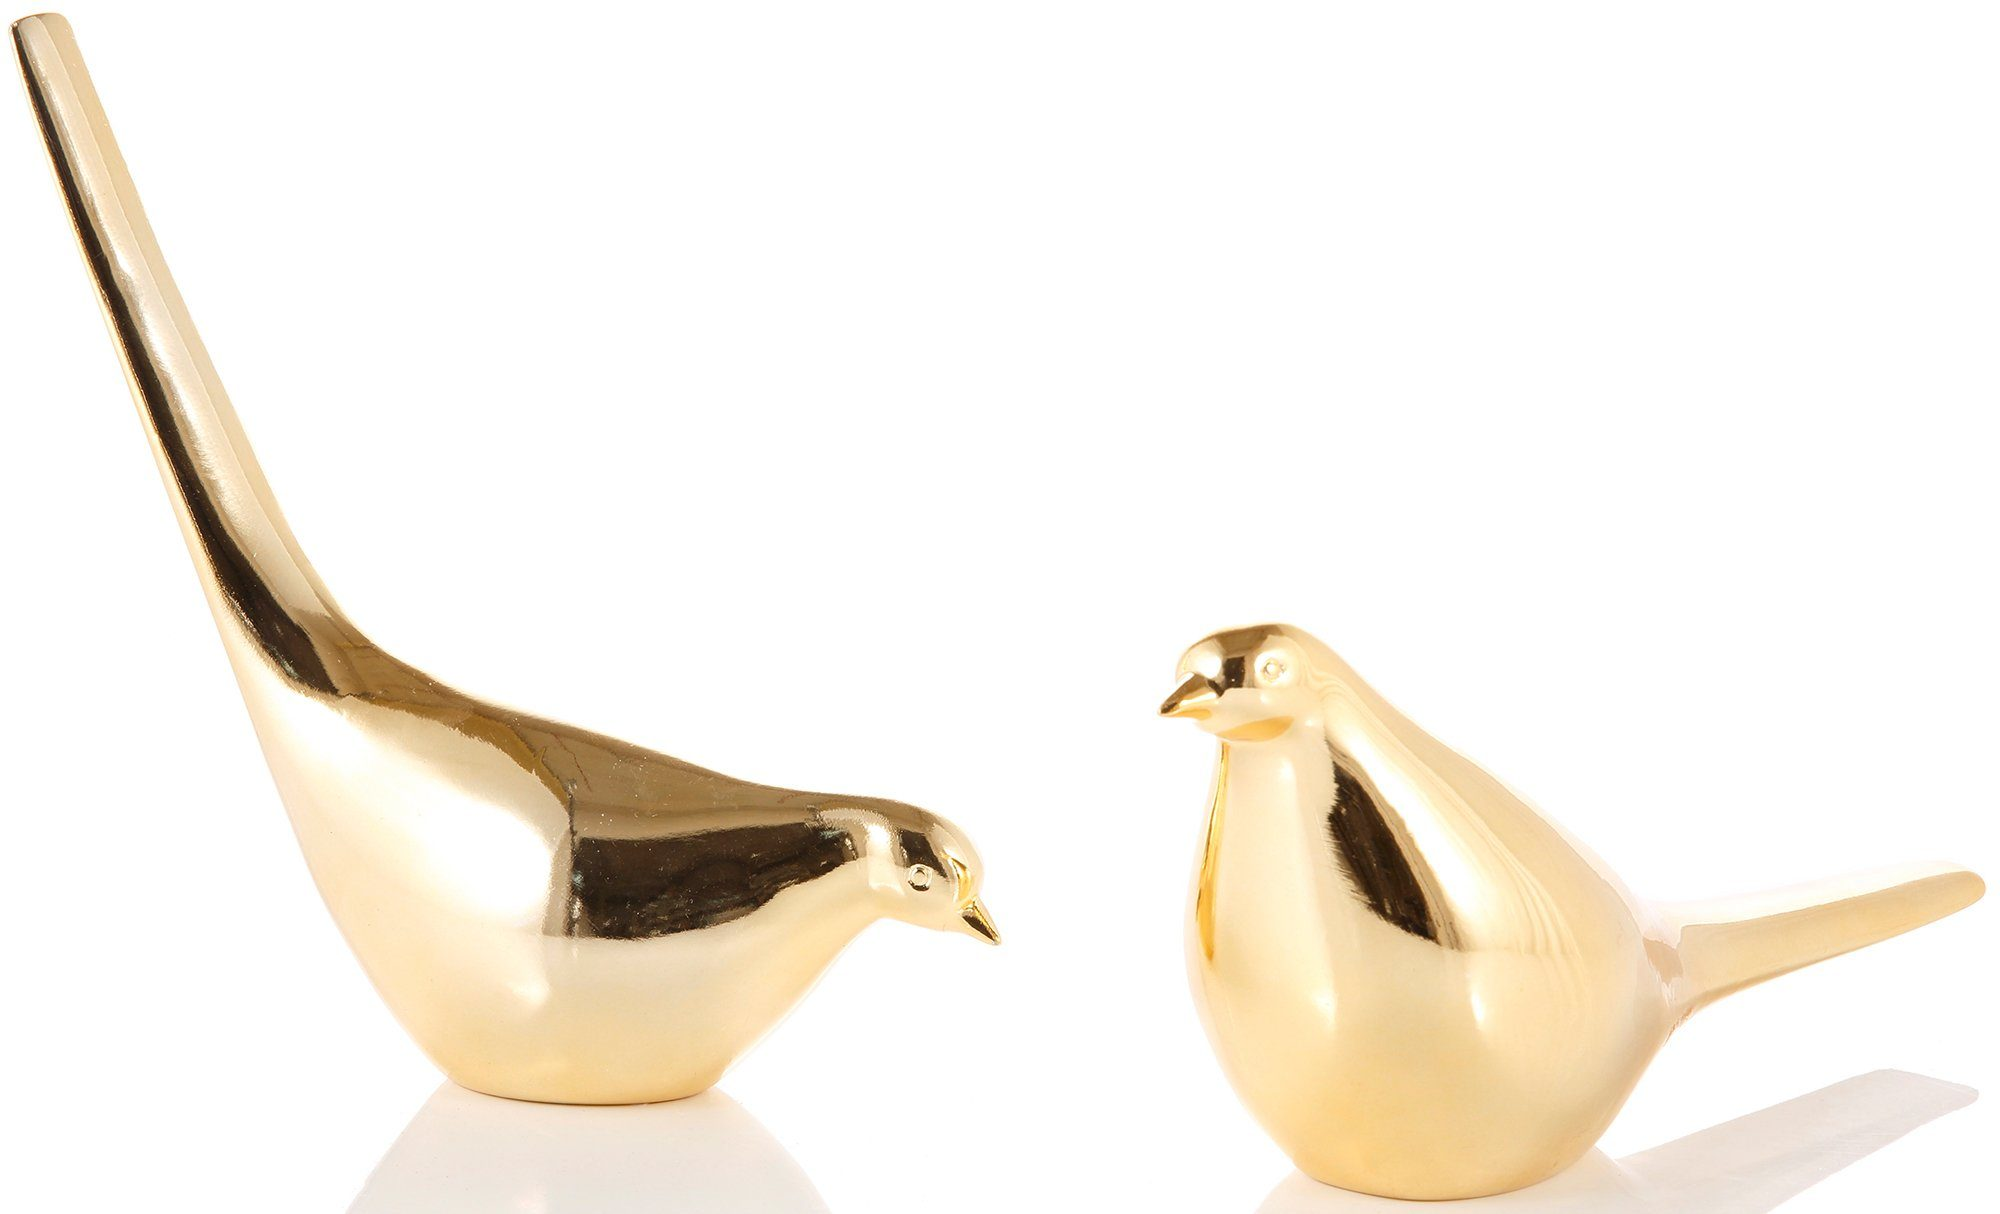 Deko-Vögel, 2-teilig